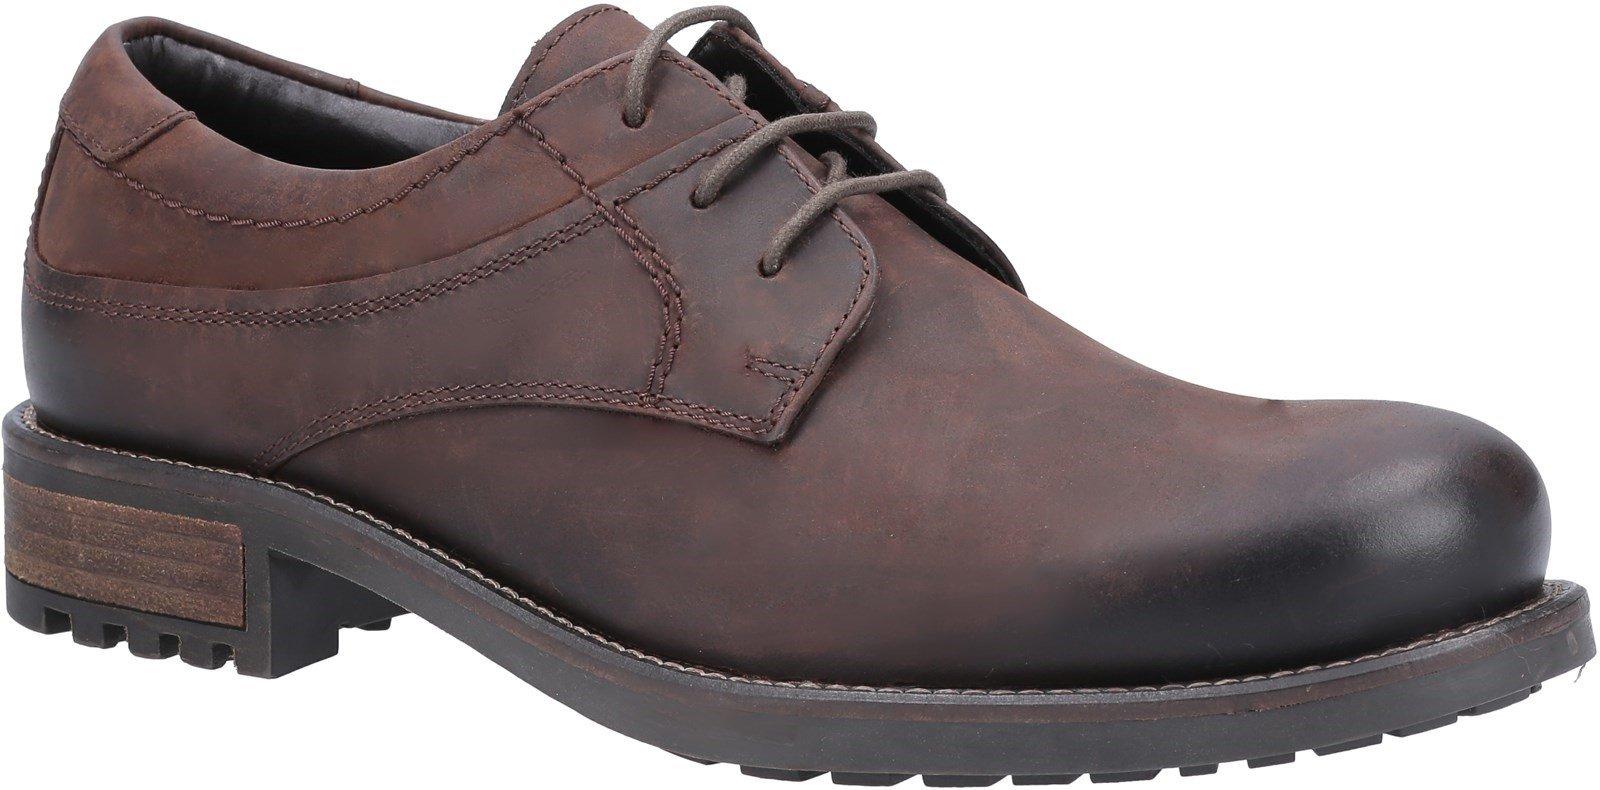 Cotswold Men's Brookthorpe Plain Toe Derby Shoe Brown 31009 - Brown 10